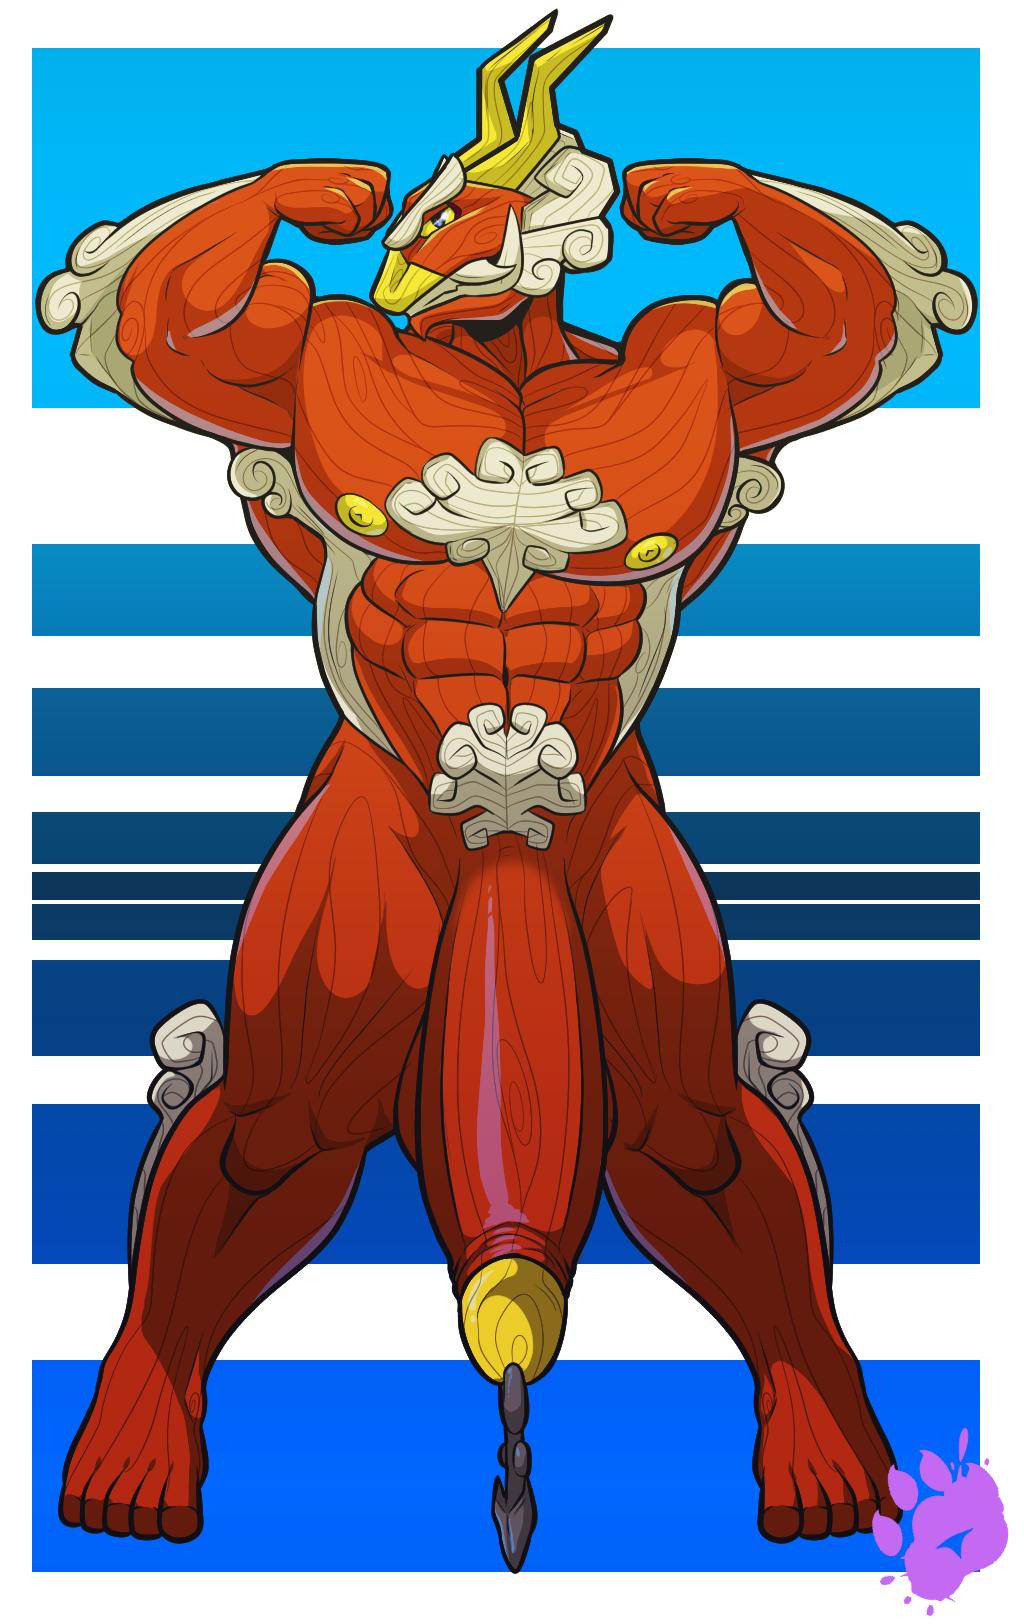 the pumpking yugioh of king ghosts Rainbow six siege futa hentai